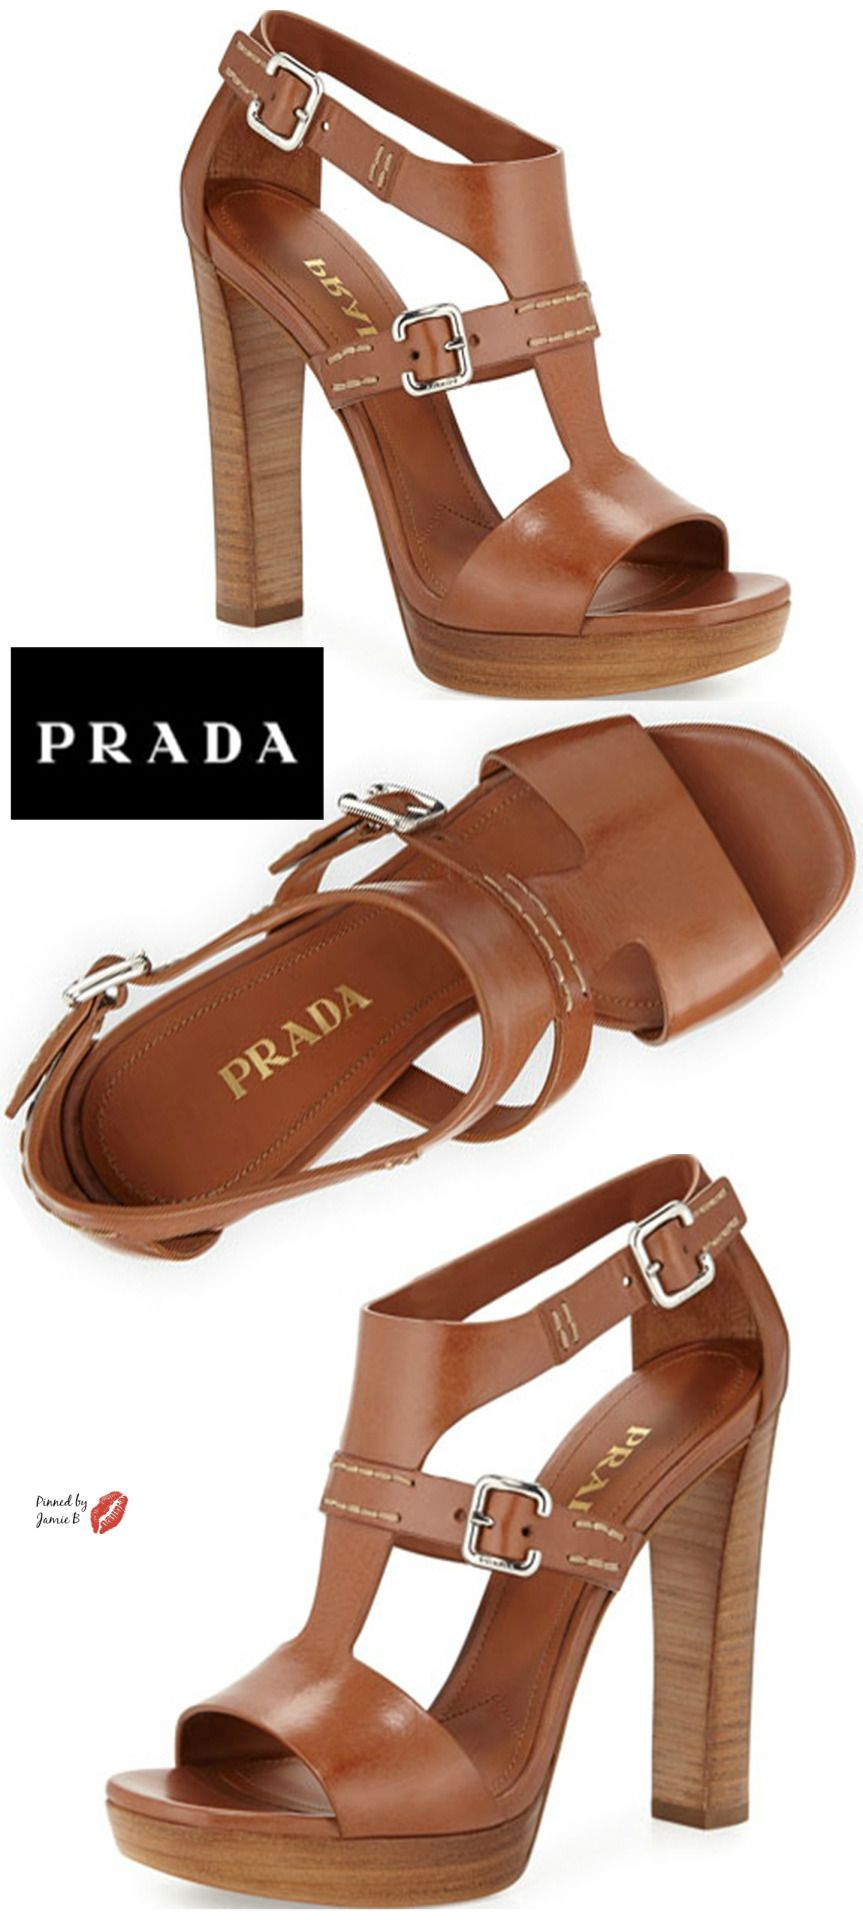 blessedshoegirl2: Prada   Leather T-Strap Sandal   Jamie B